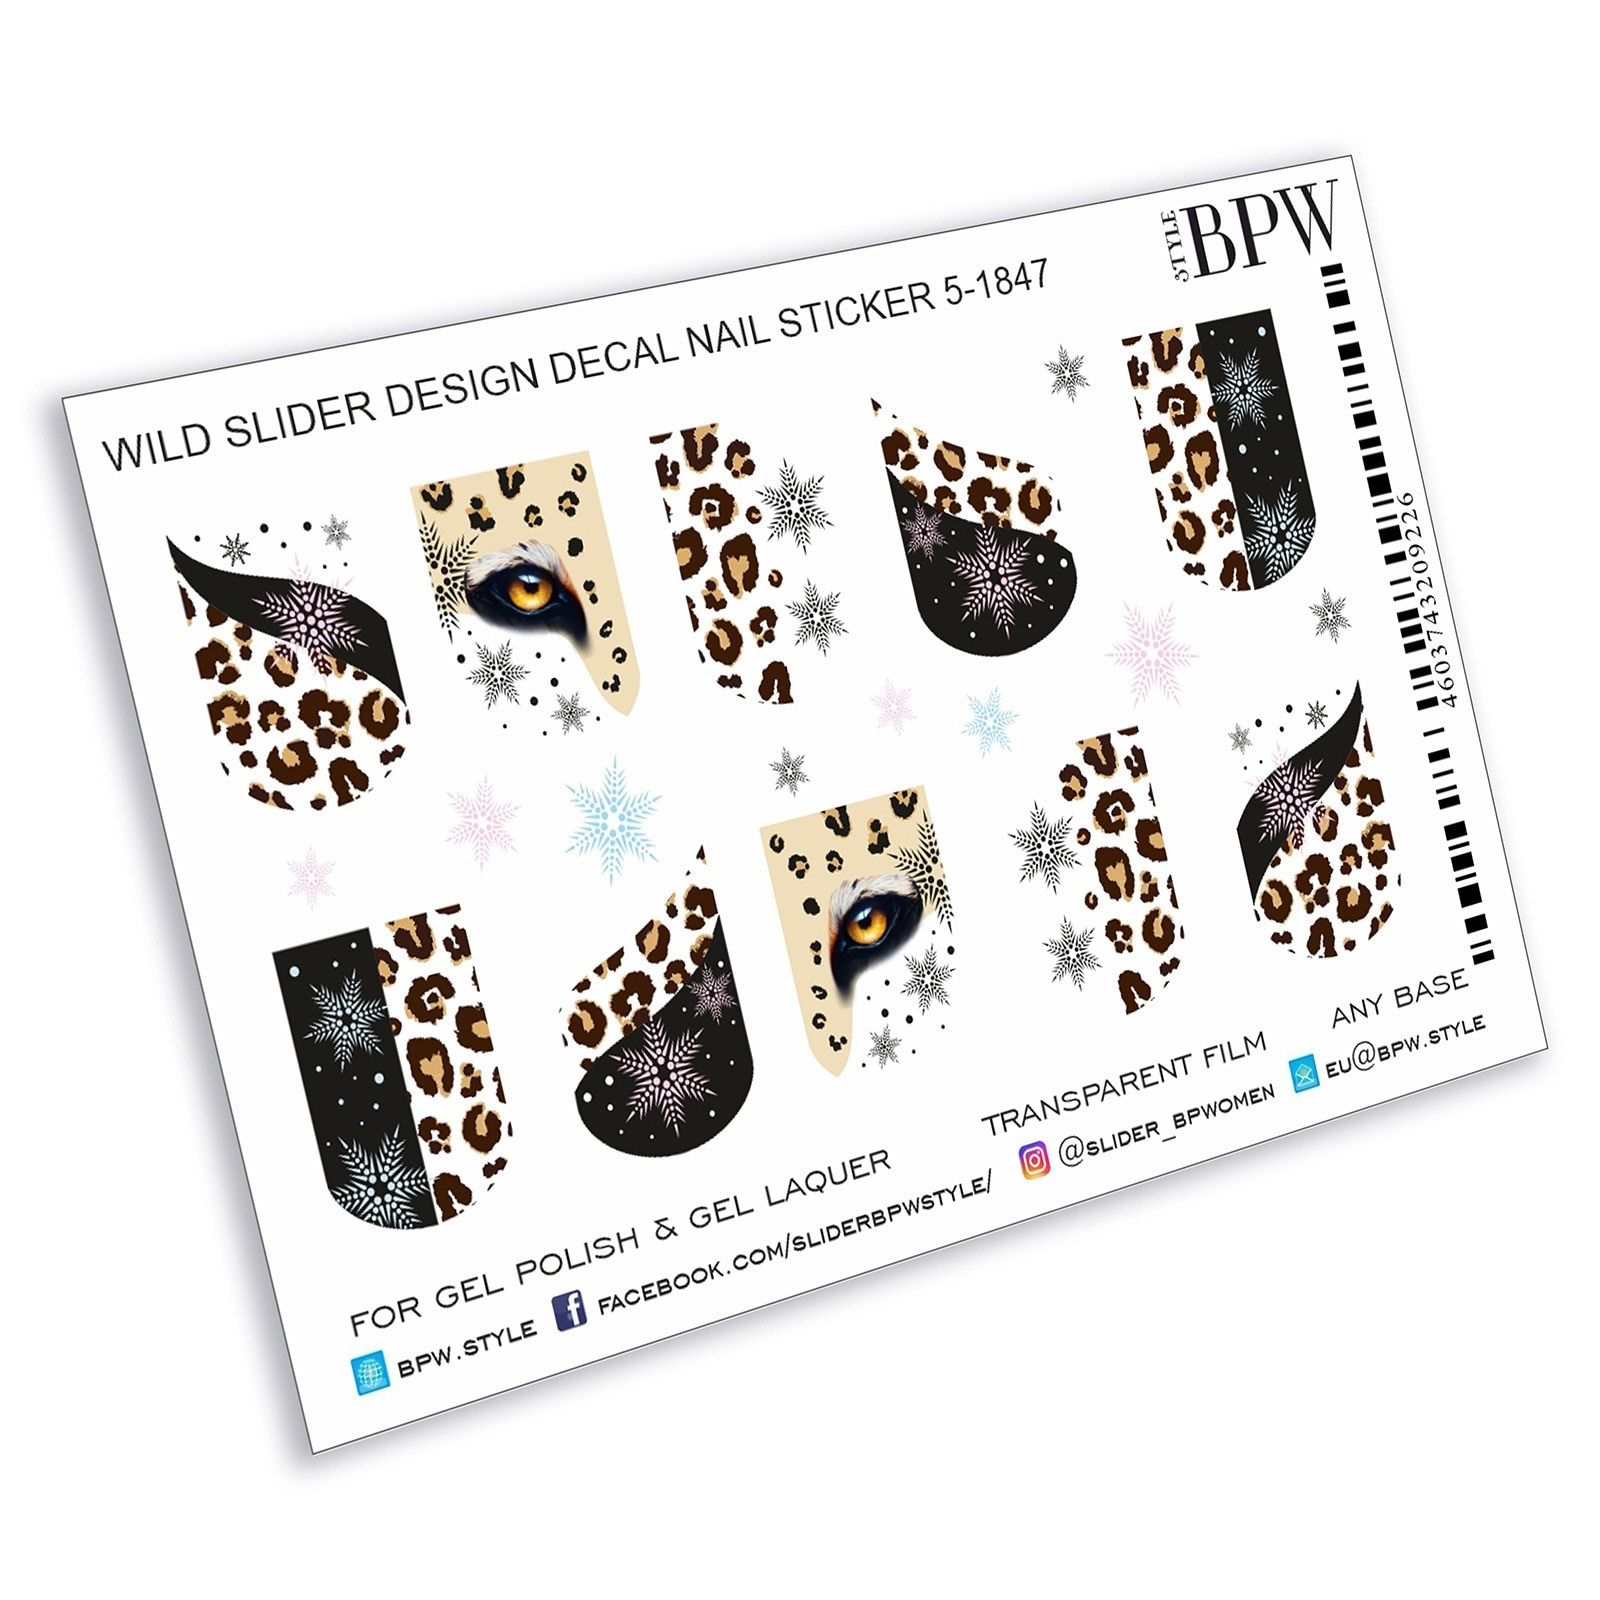 Слайдер-дизайн Леопард со снежинками, BPW.style, наклейки на ногти, sd5-1847